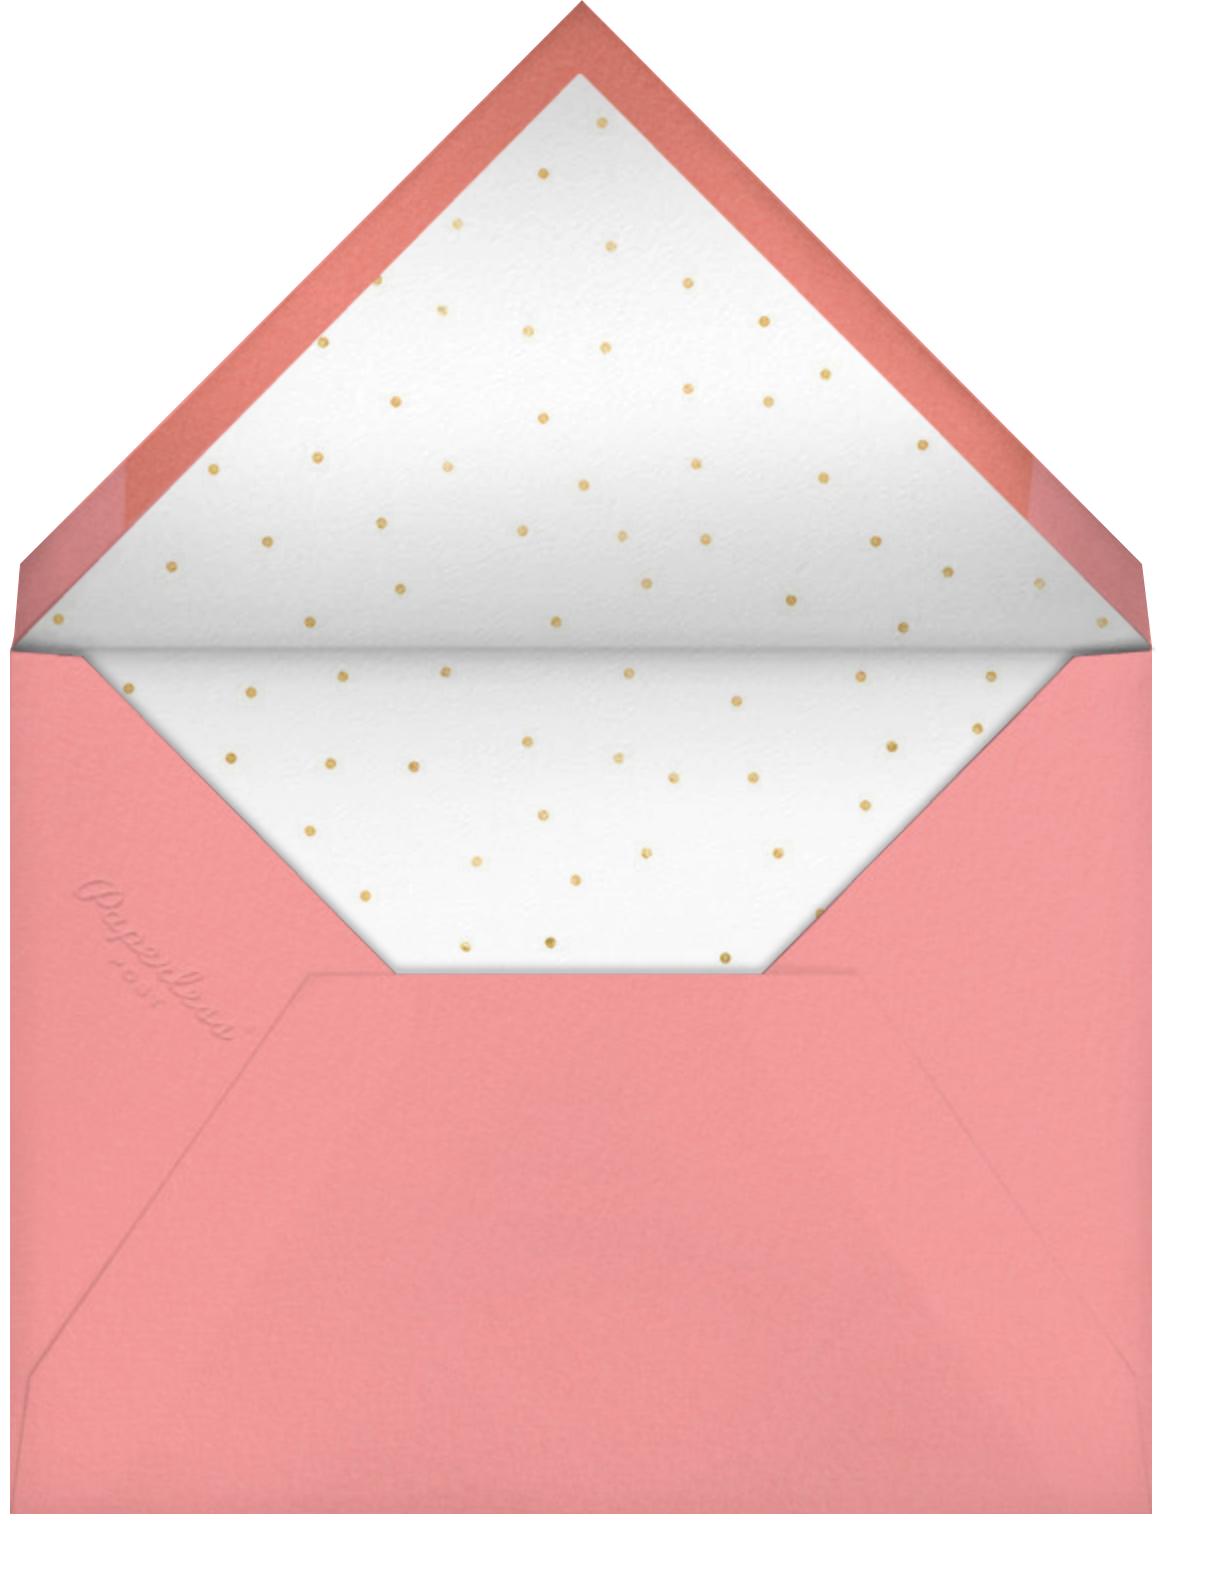 Sweet Tea - Paperless Post - Wedding brunch - envelope back